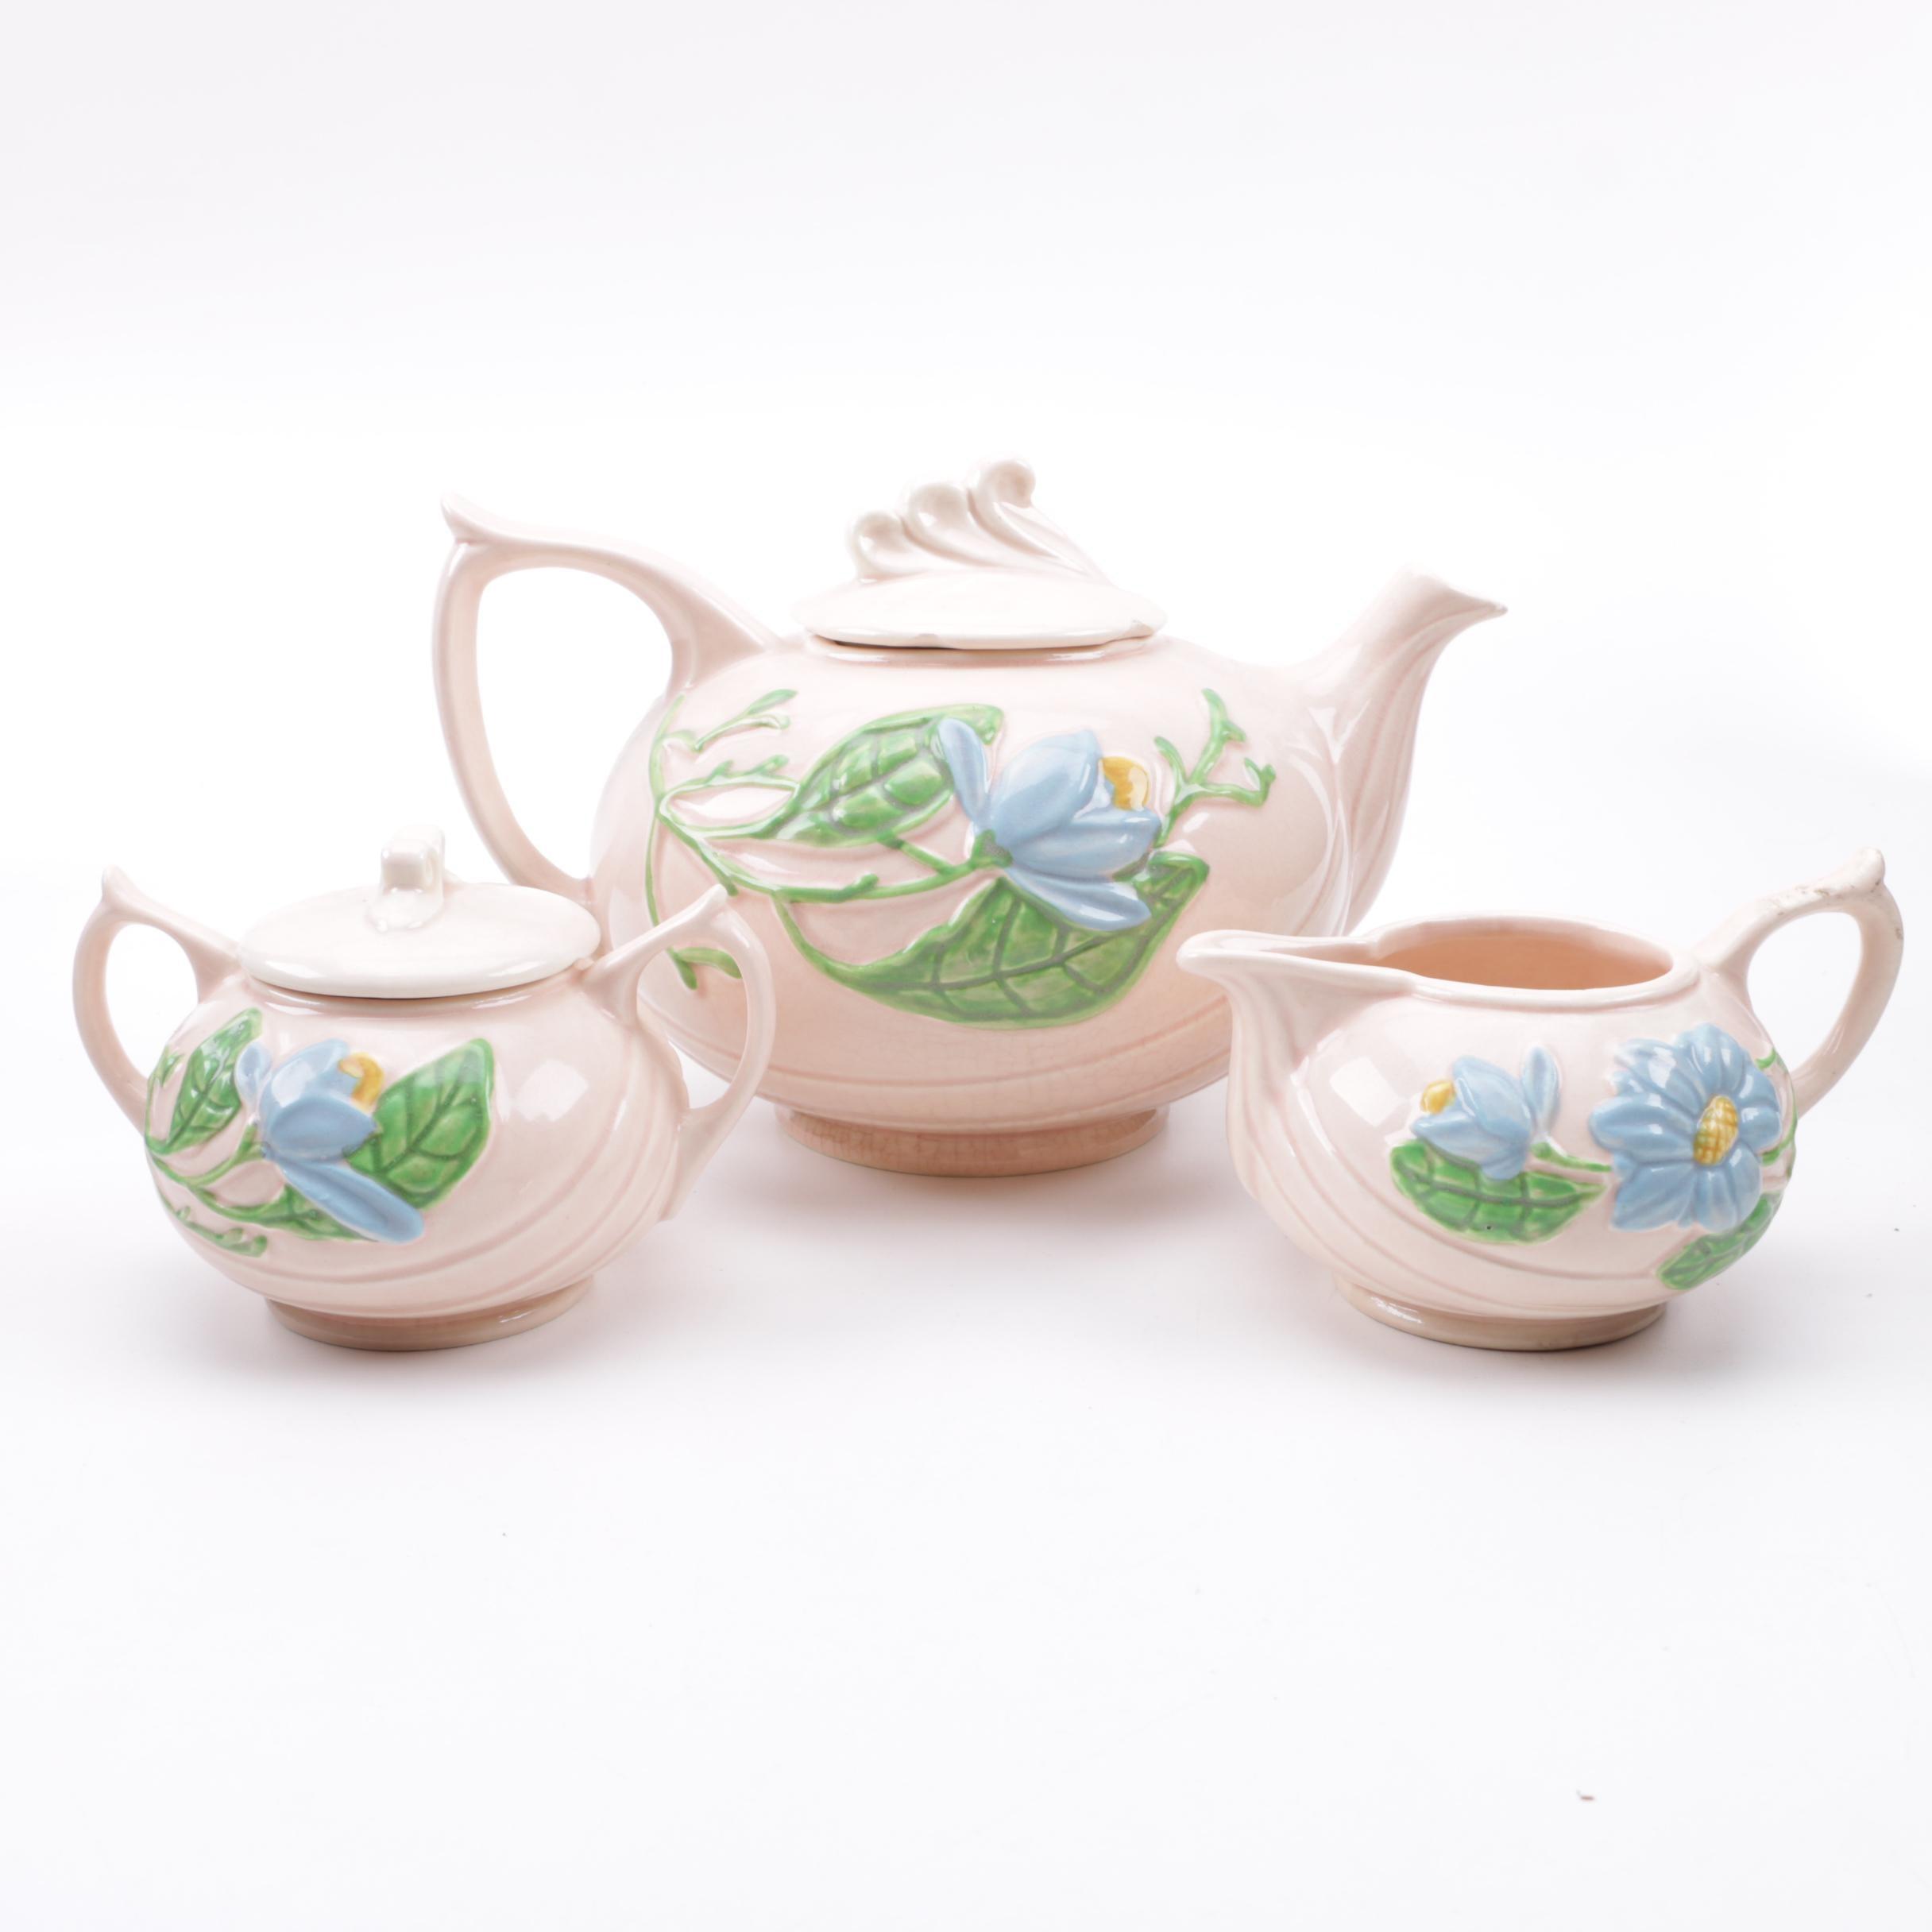 Hull Art Pottery Ceramic Tea Set